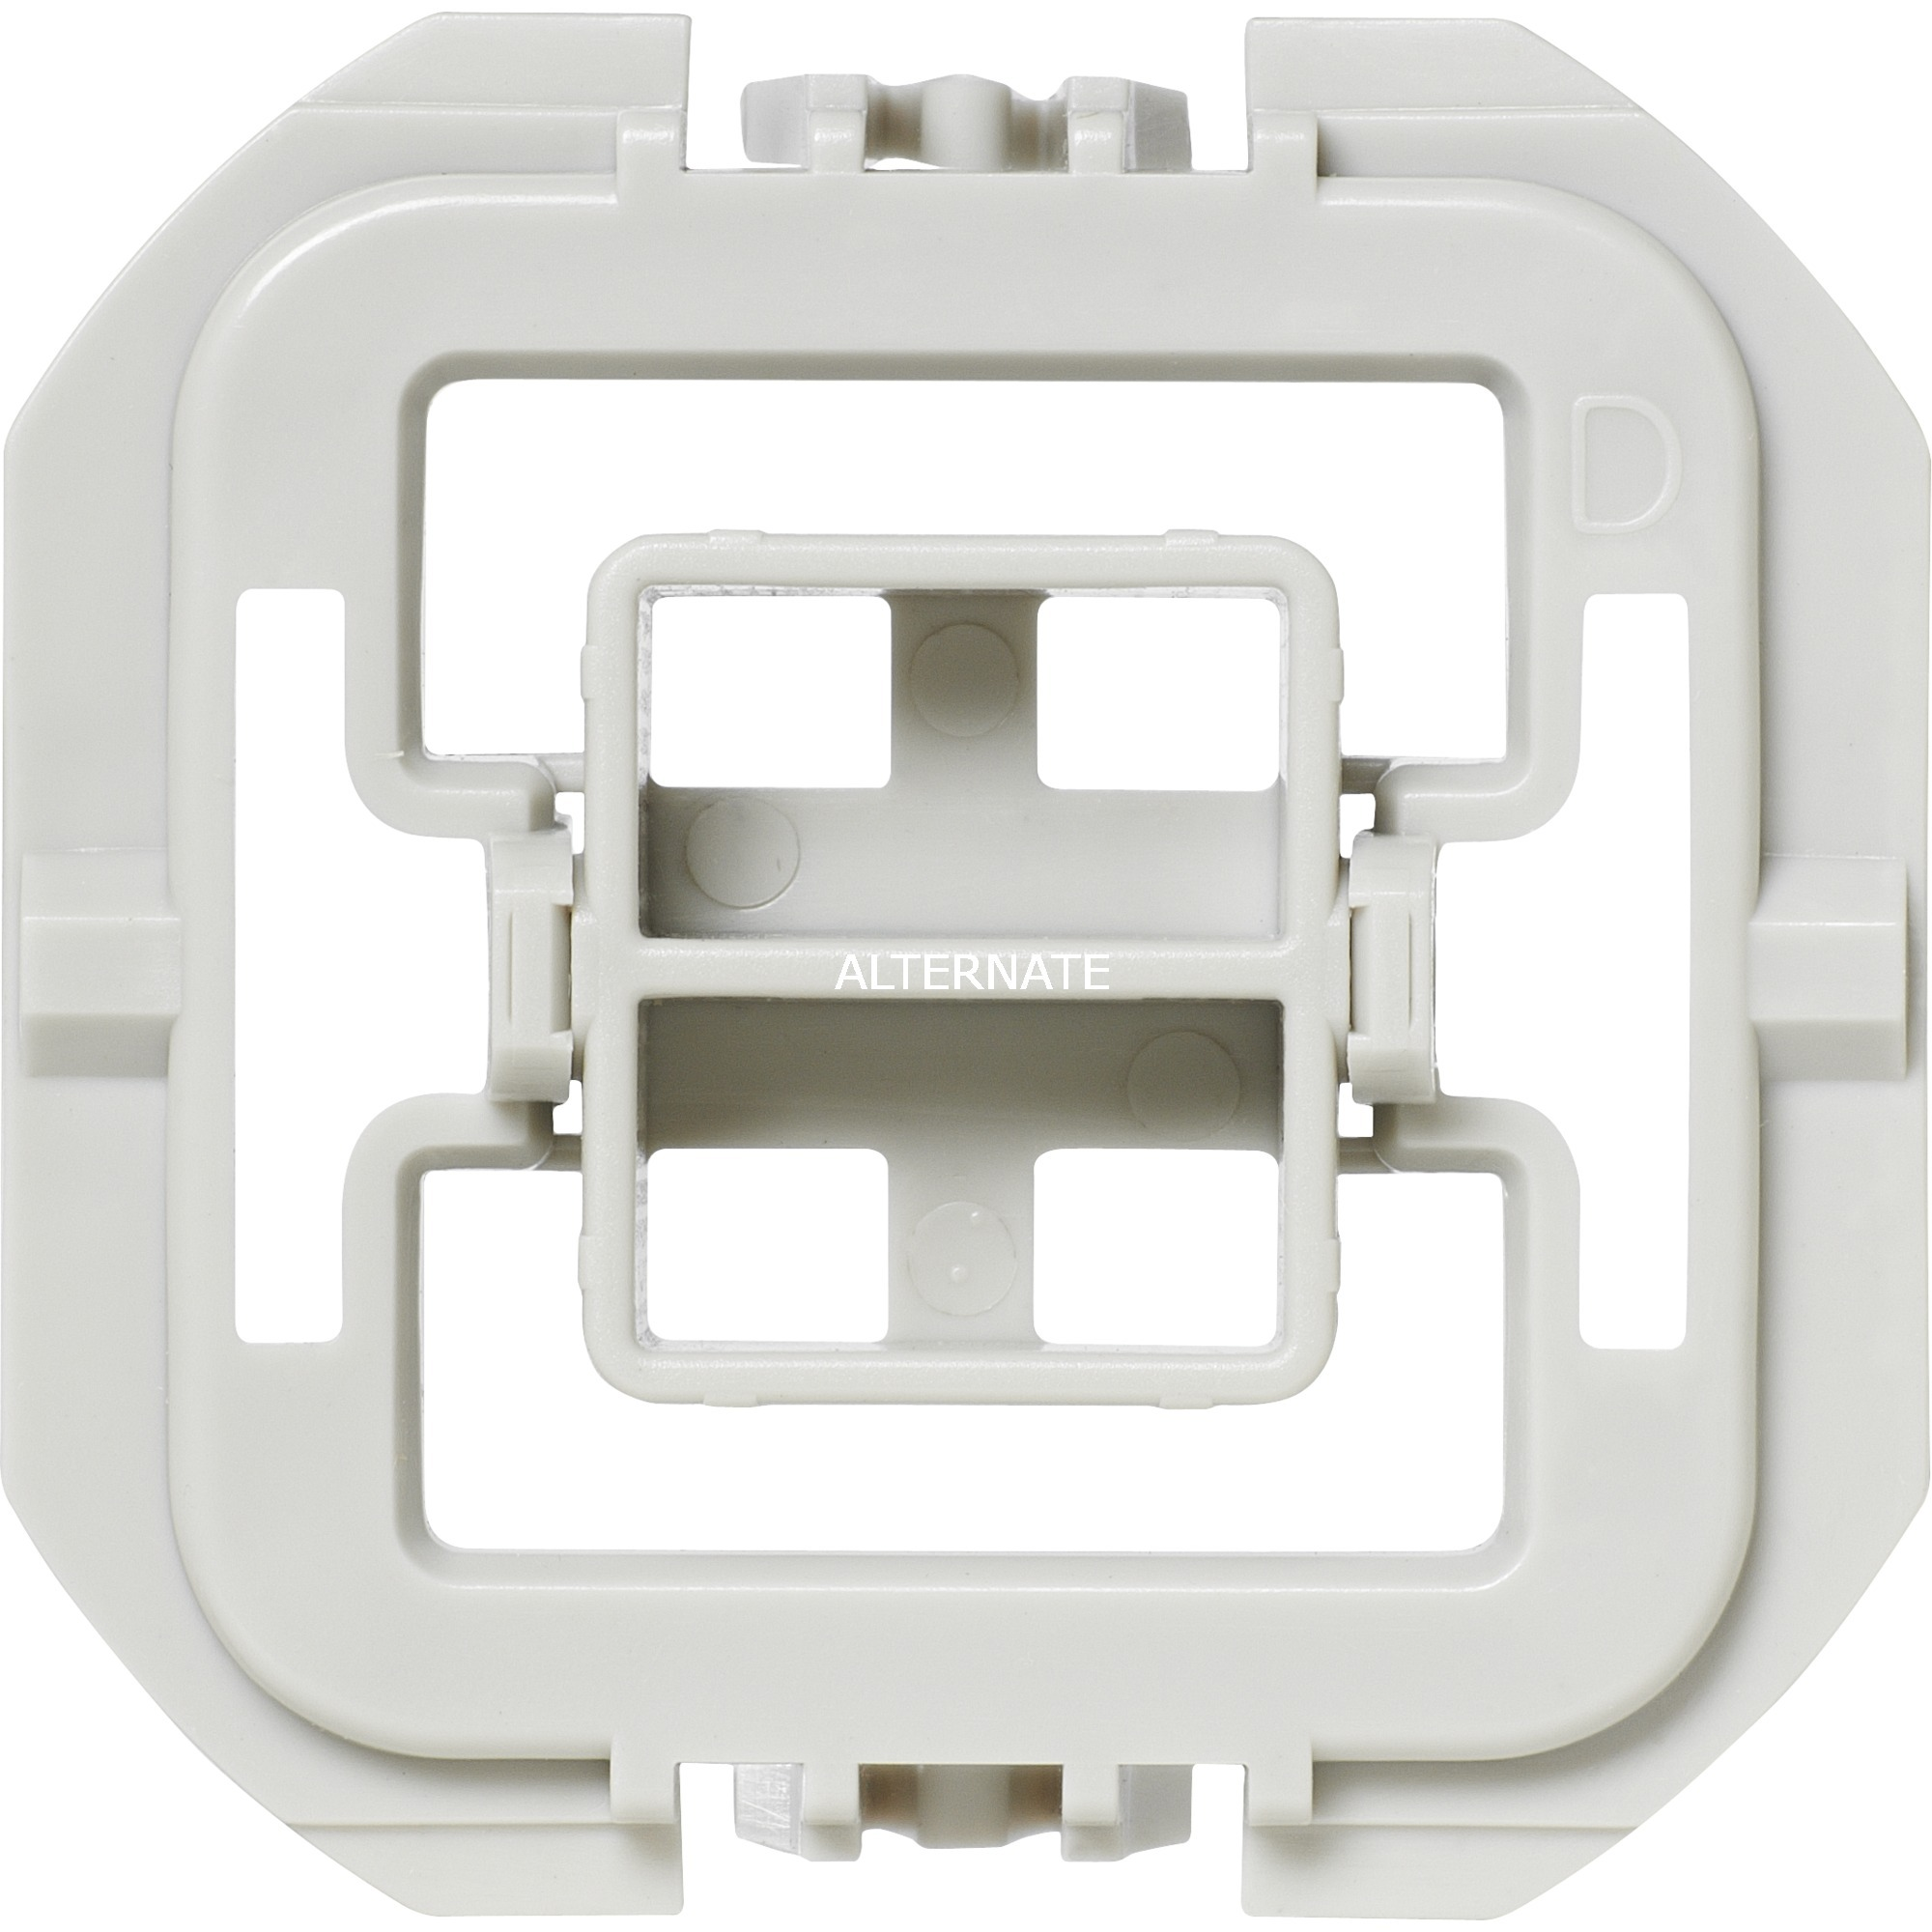 EQ3-ADA-DW Atenuador e interruptor Integrado Blanco, Adaptador